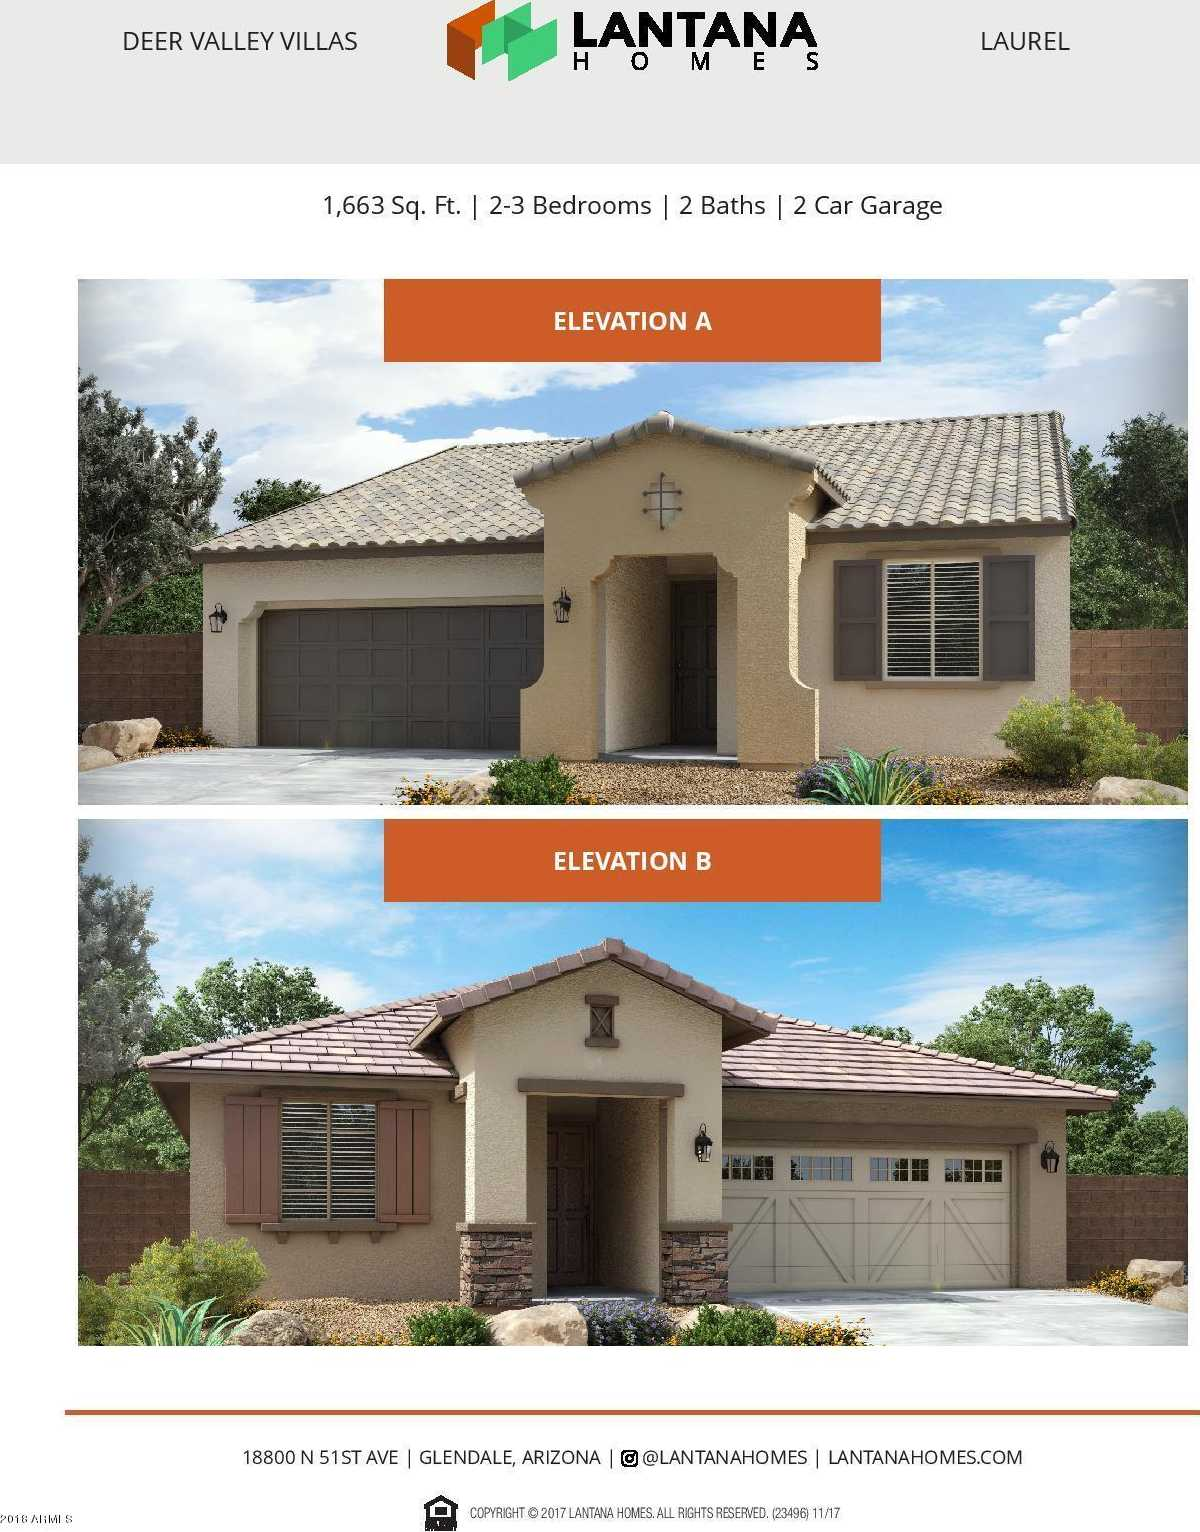 $318,400 - 3Br/2Ba - Home for Sale in Deer Valley Villas, Glendale